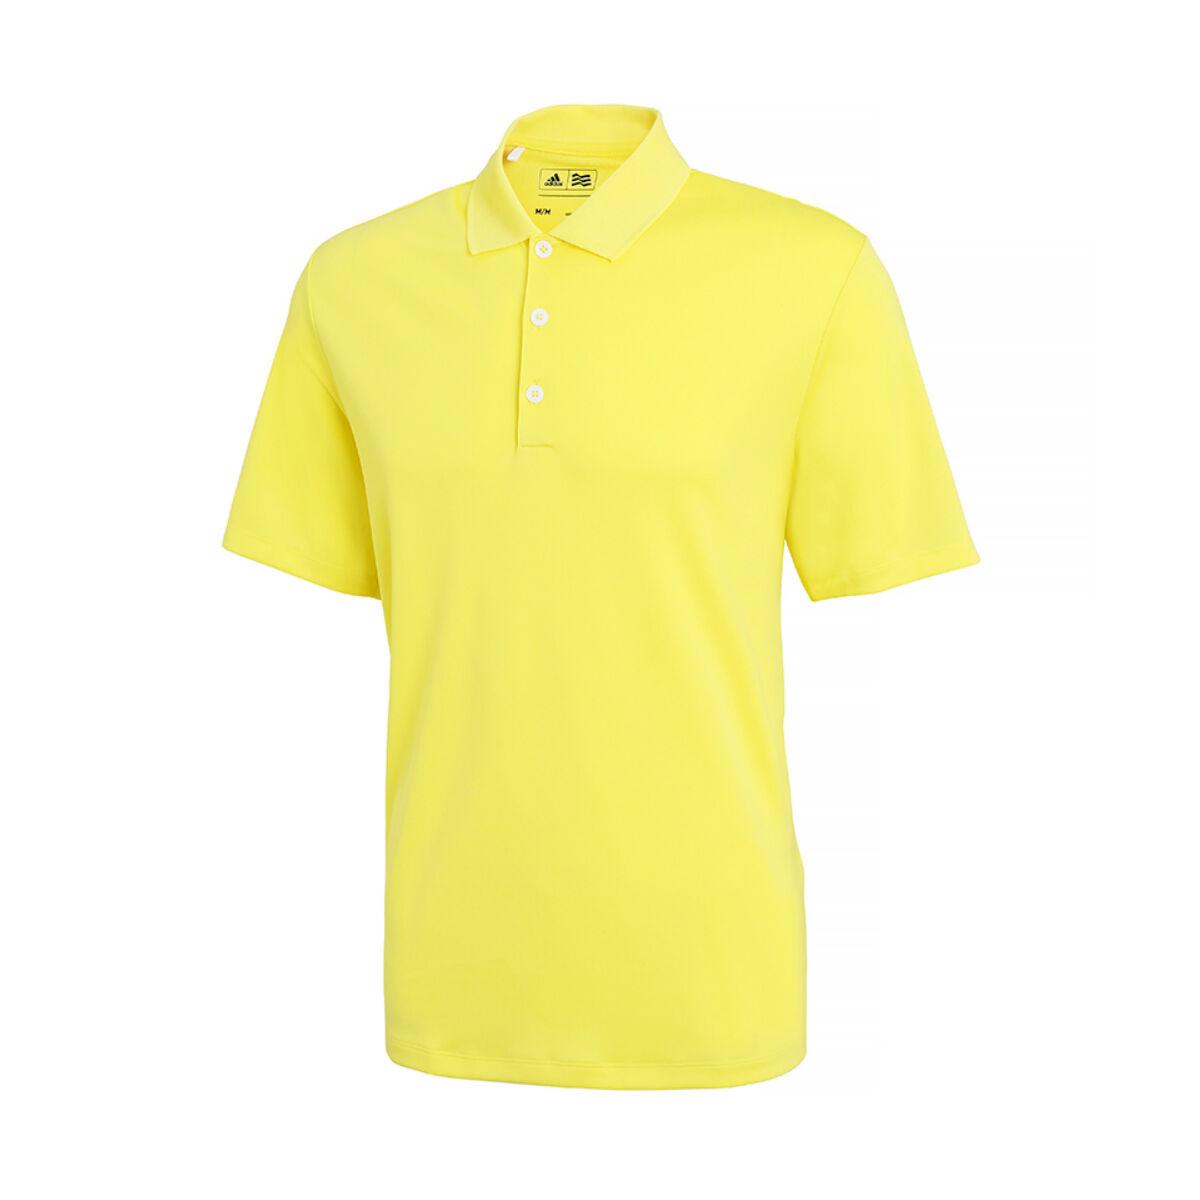 Adidas Golf Polo (Light Yellow)